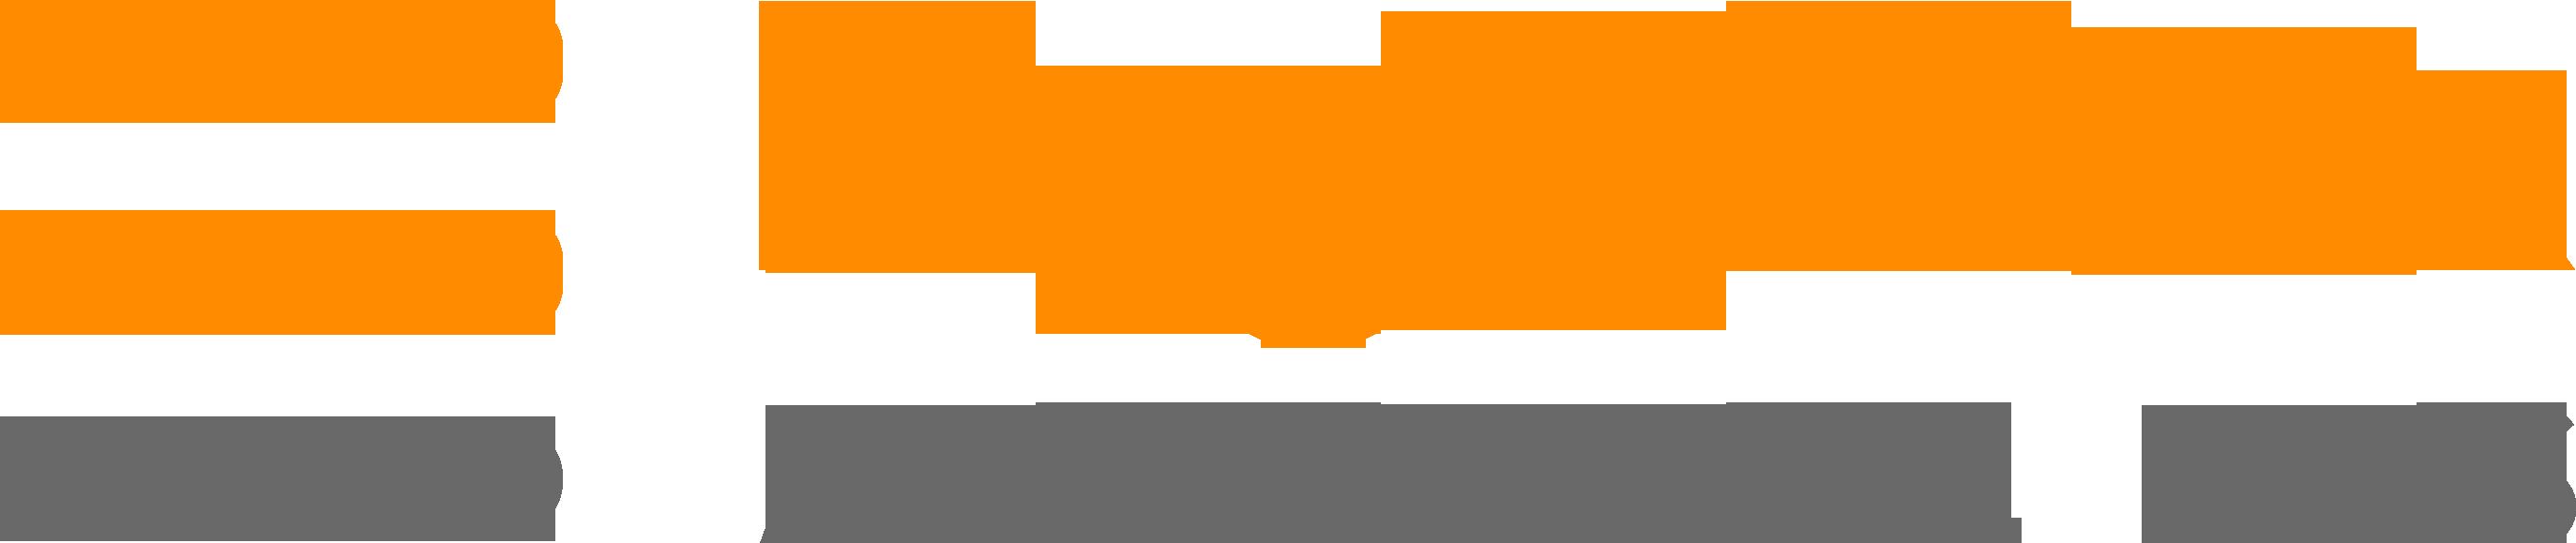 BagBox Automatical Lines | Paletizado automatico robotizado